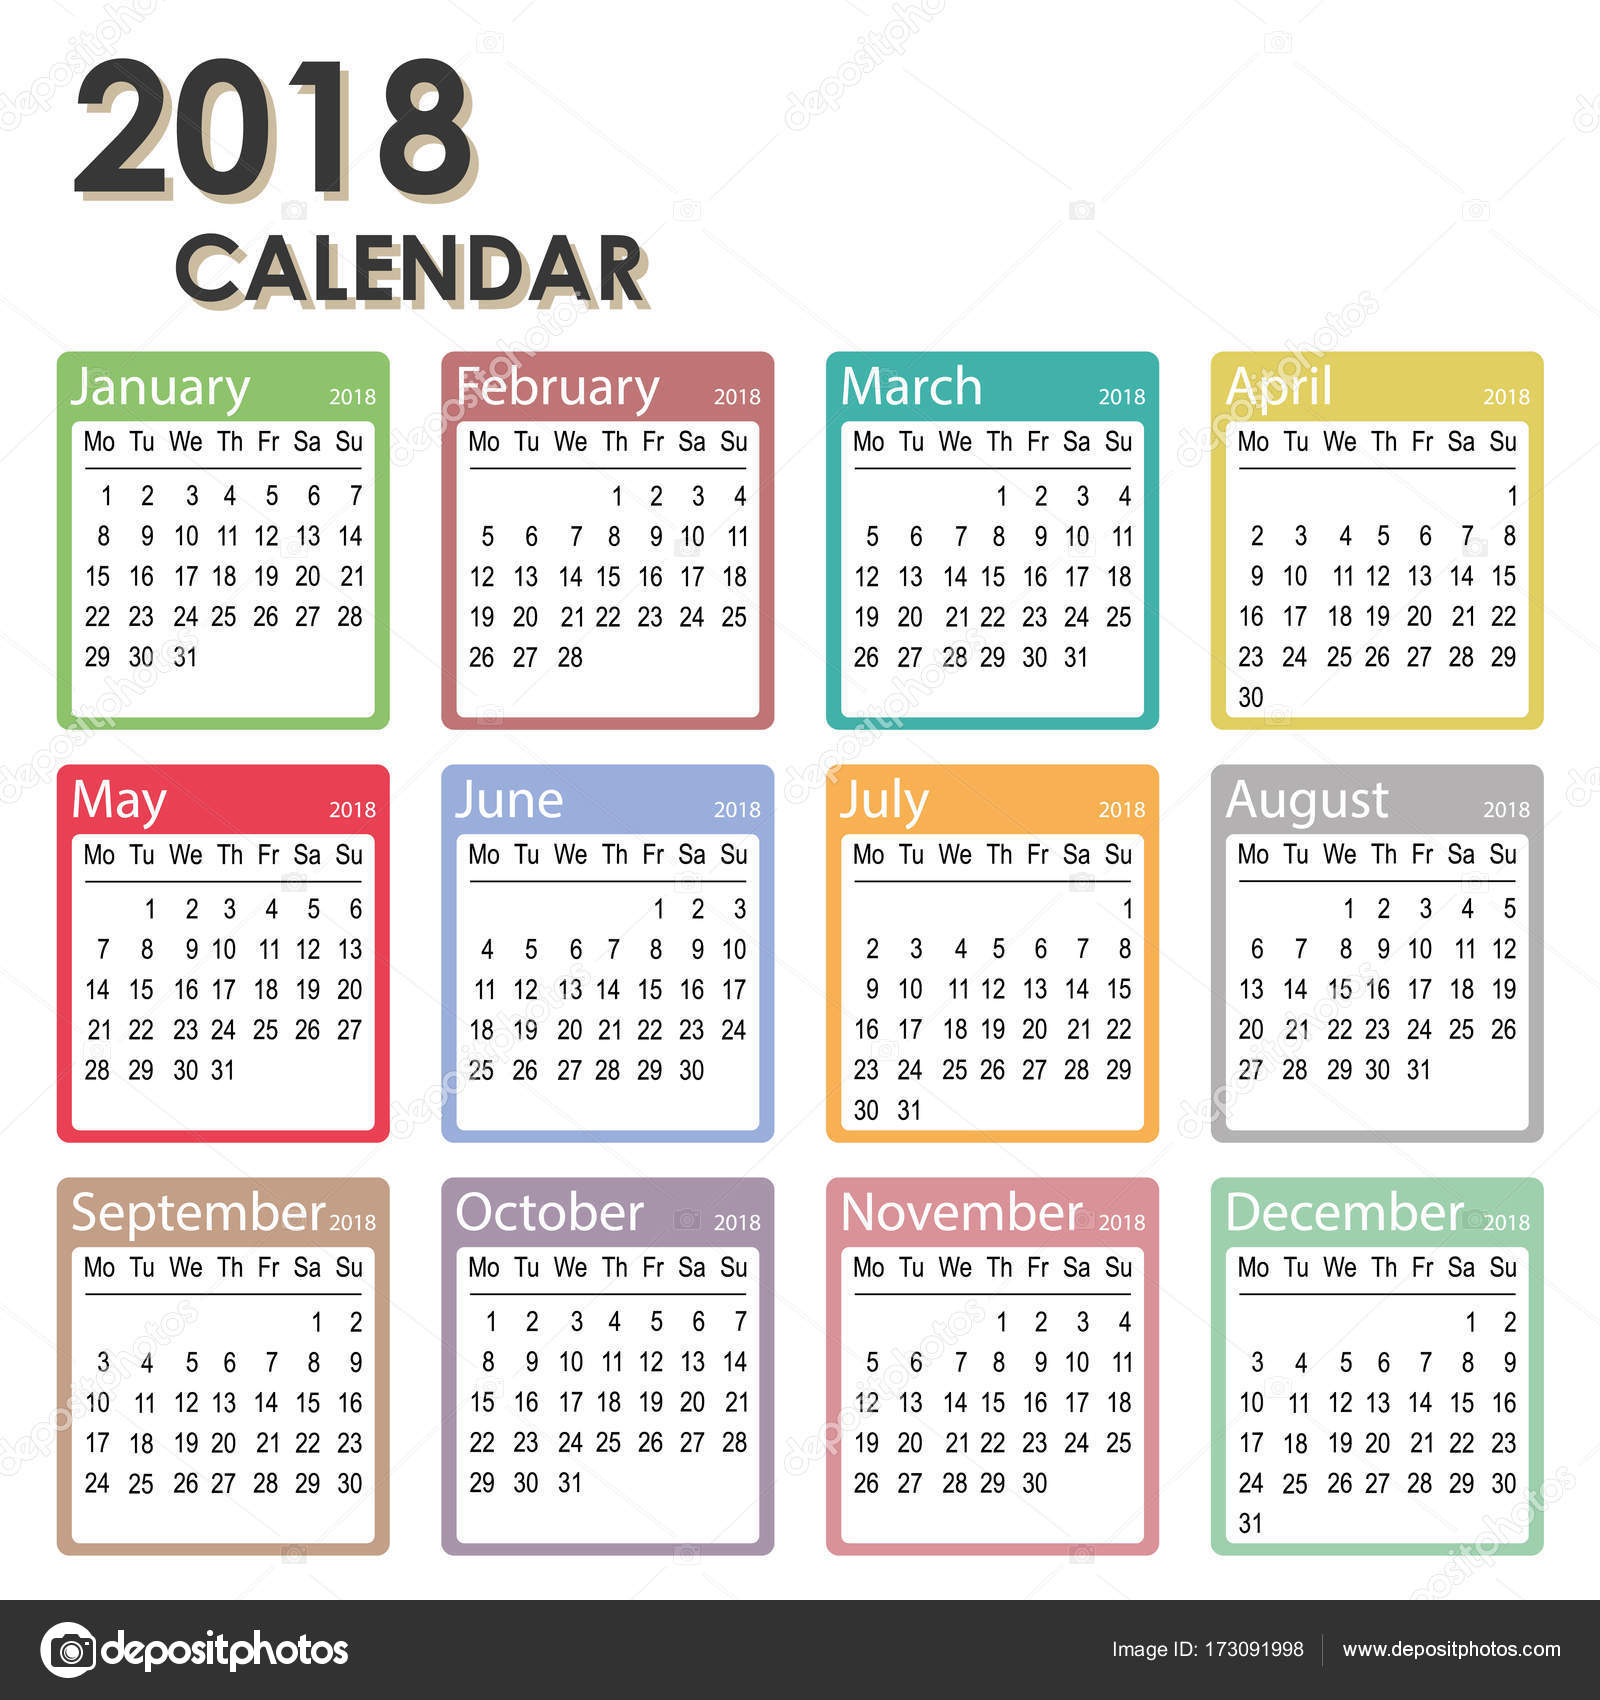 2018 year calendar week starts on monday monthly calendar template 2018 printable calendar